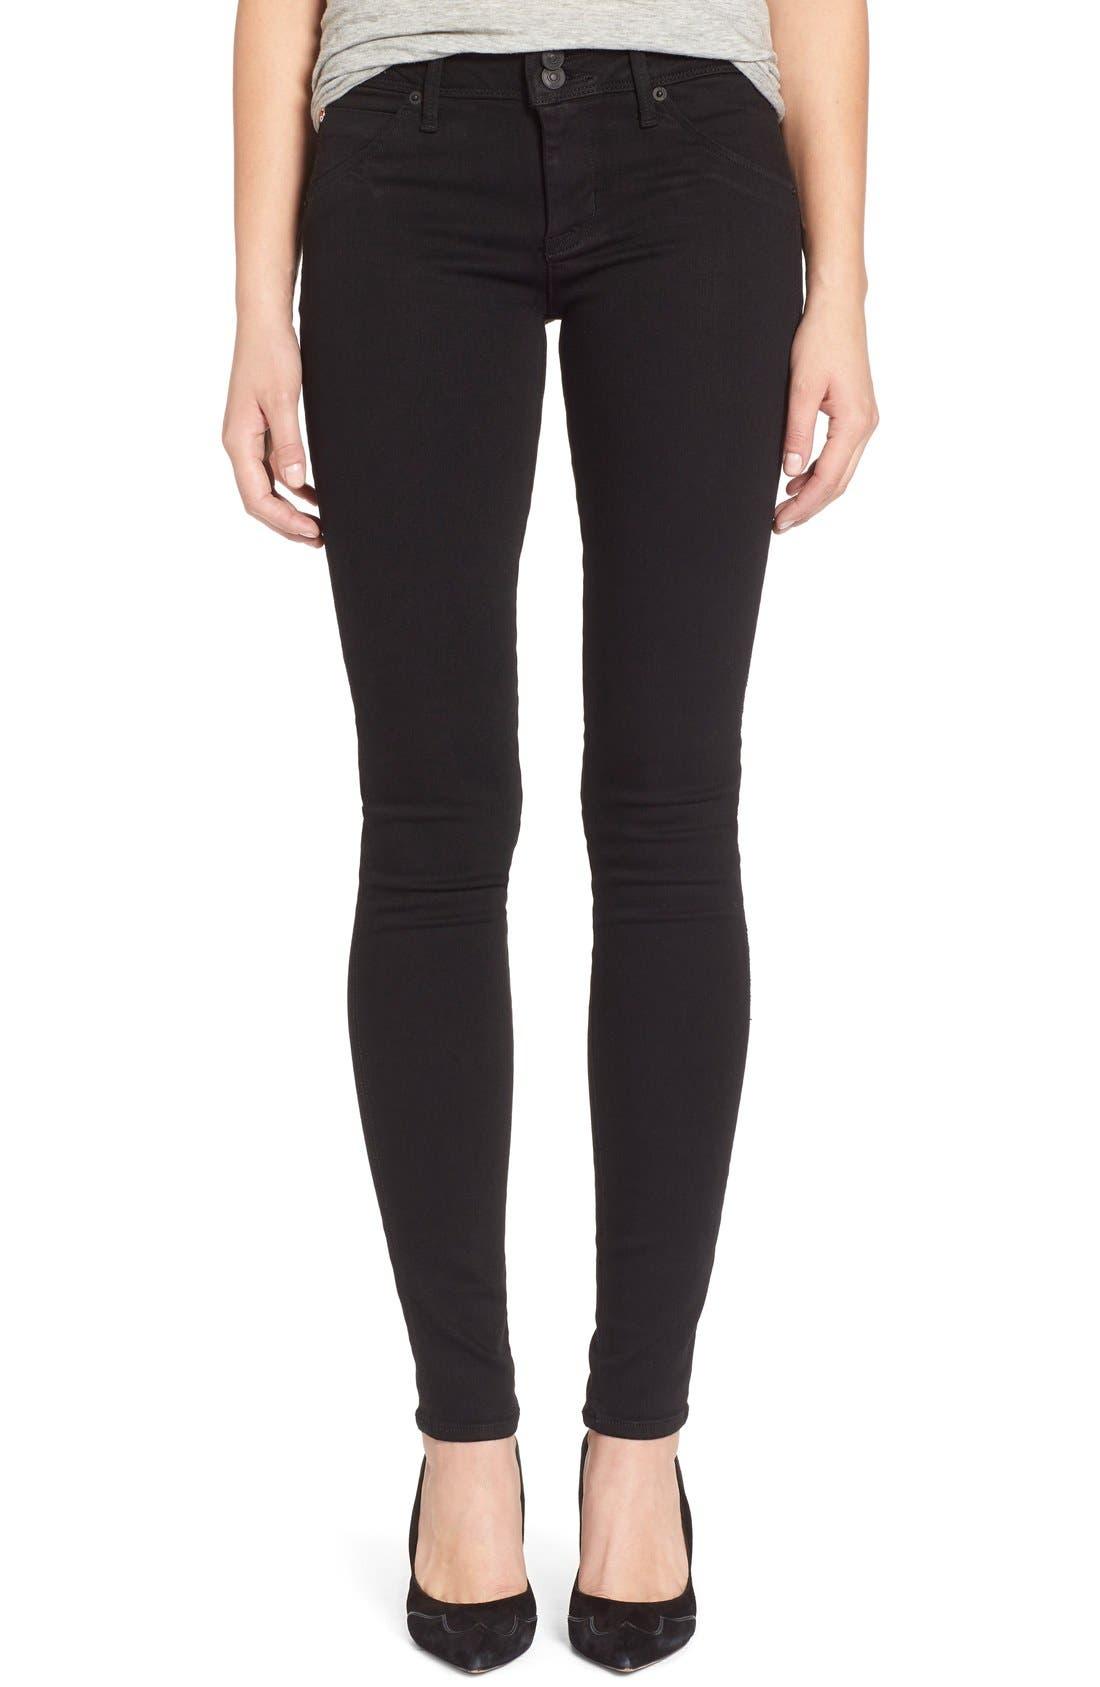 Alternate Image 1 Selected - Hudson Jeans 'Collin' Supermodel Skinny Jeans (Black) (Long)